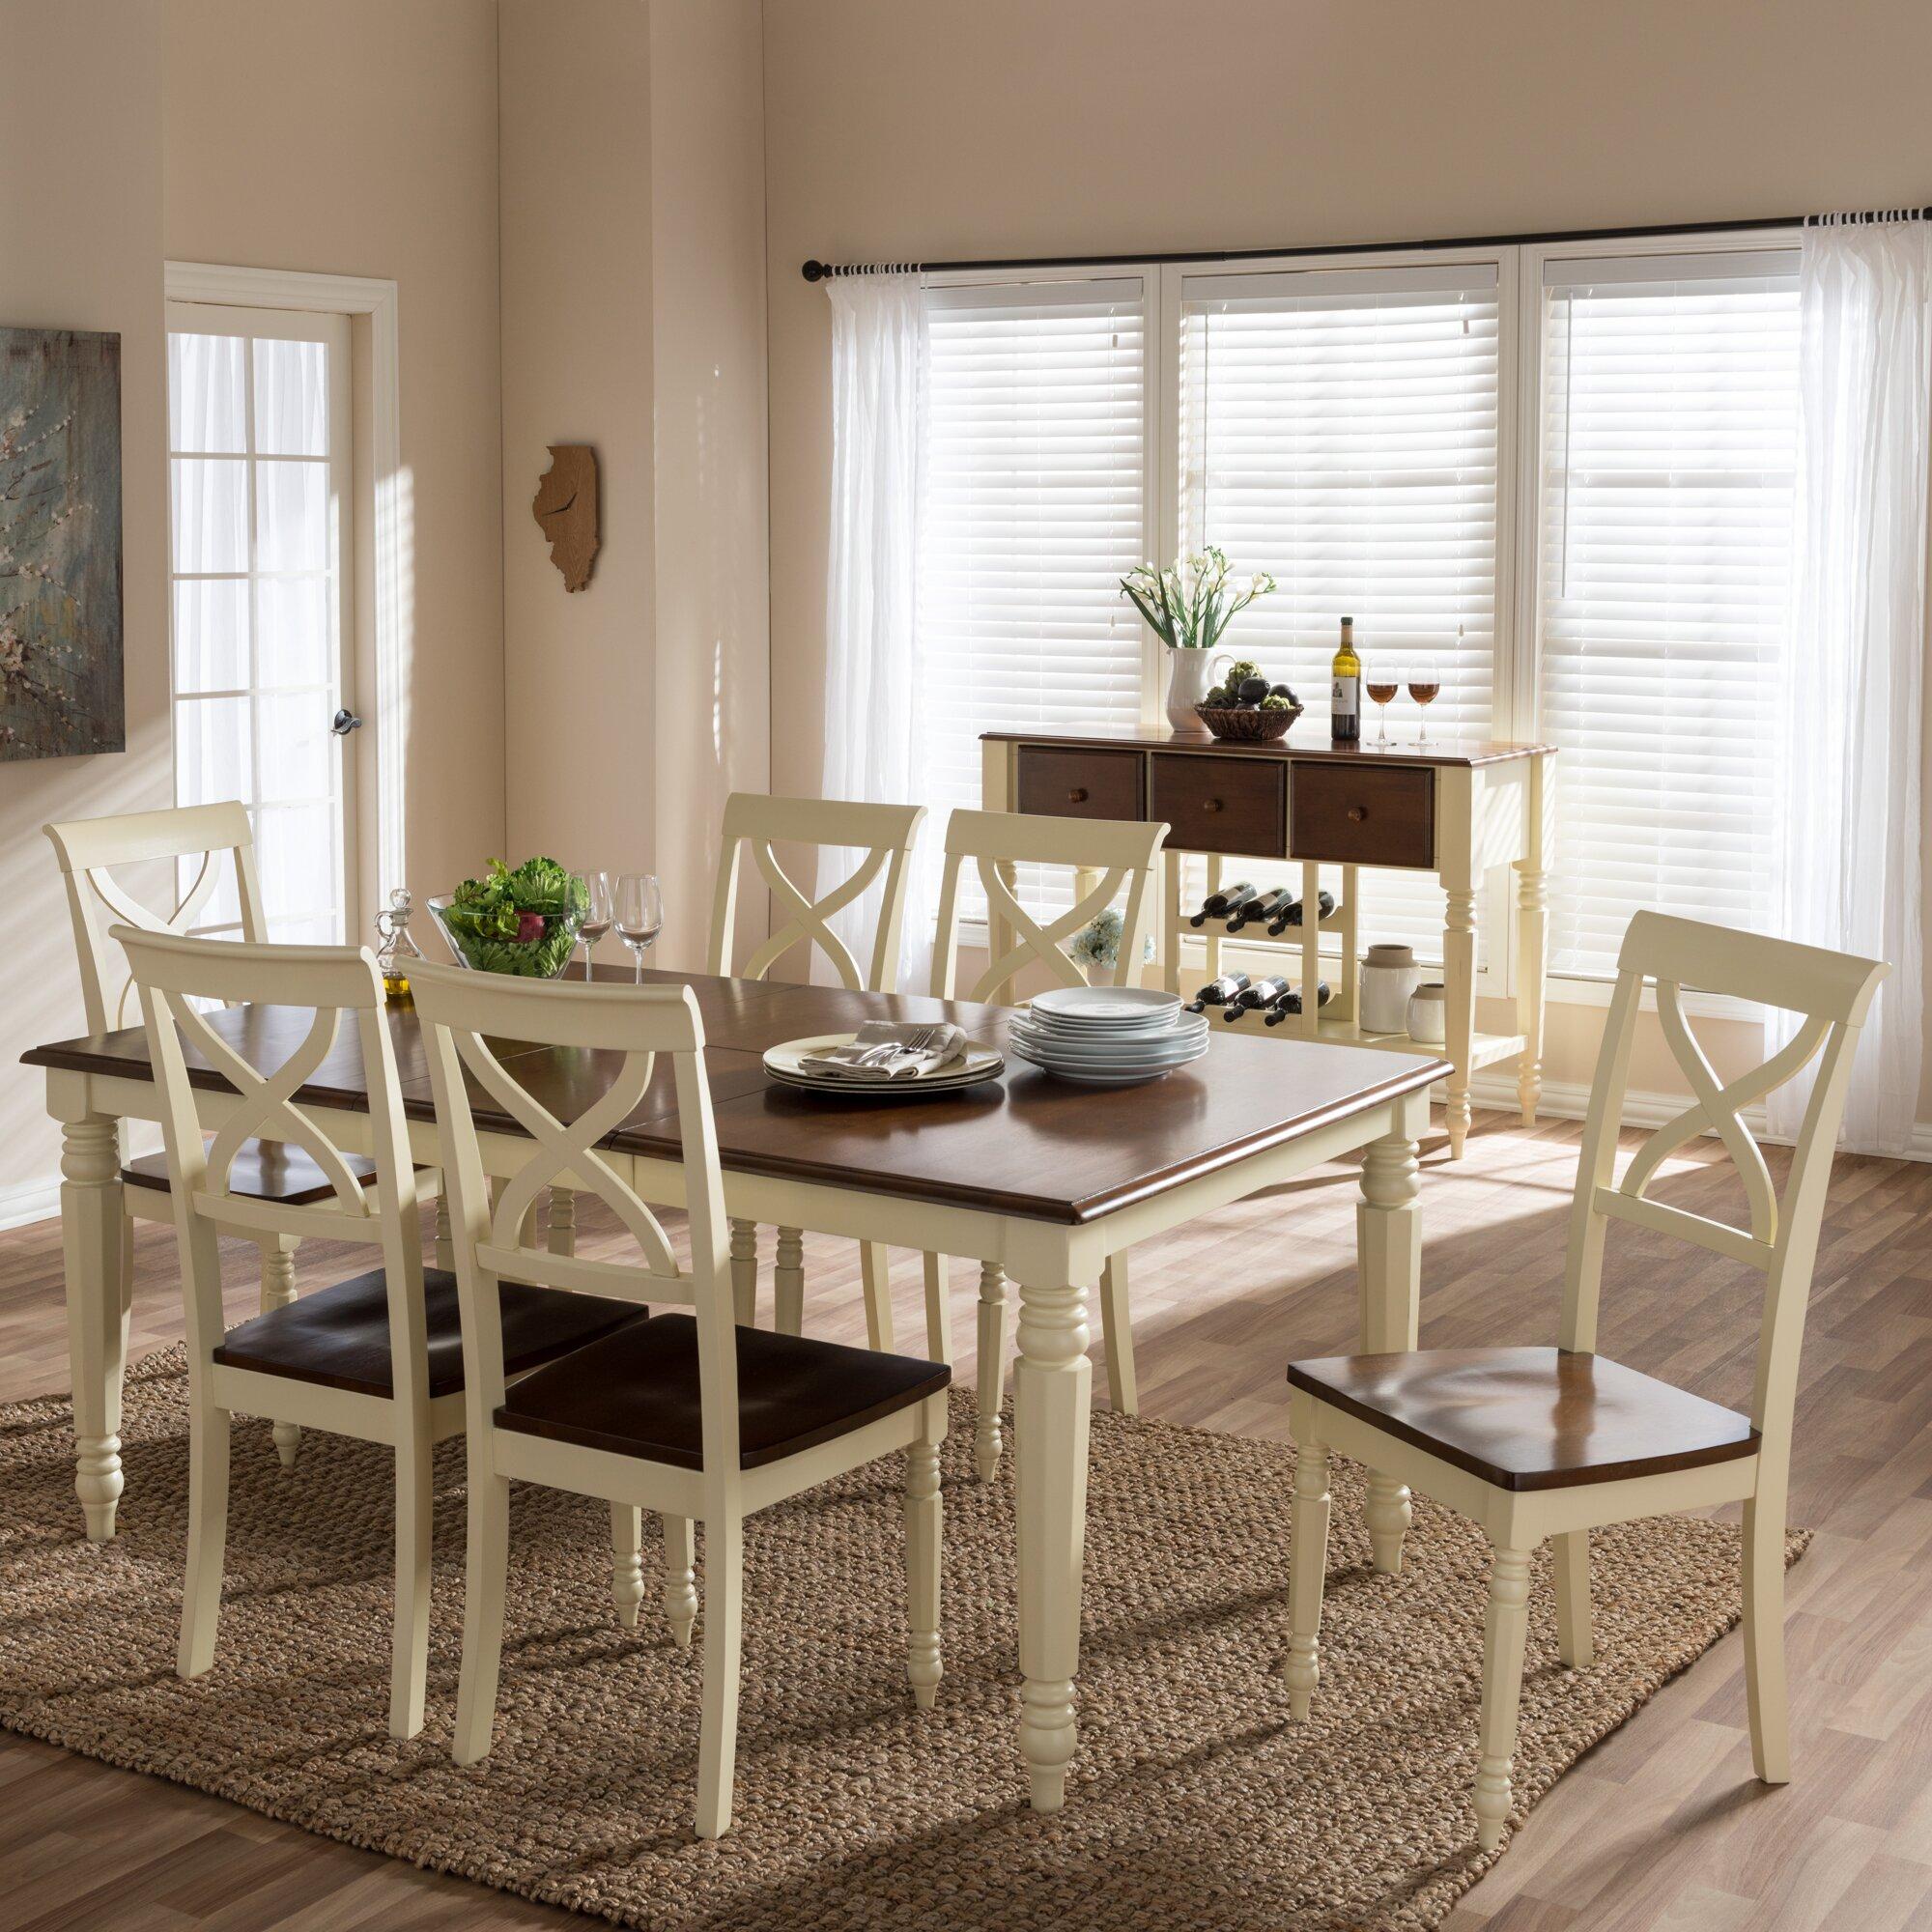 wholesale interiors baxton studio 8 piece dining set wayfair. Black Bedroom Furniture Sets. Home Design Ideas